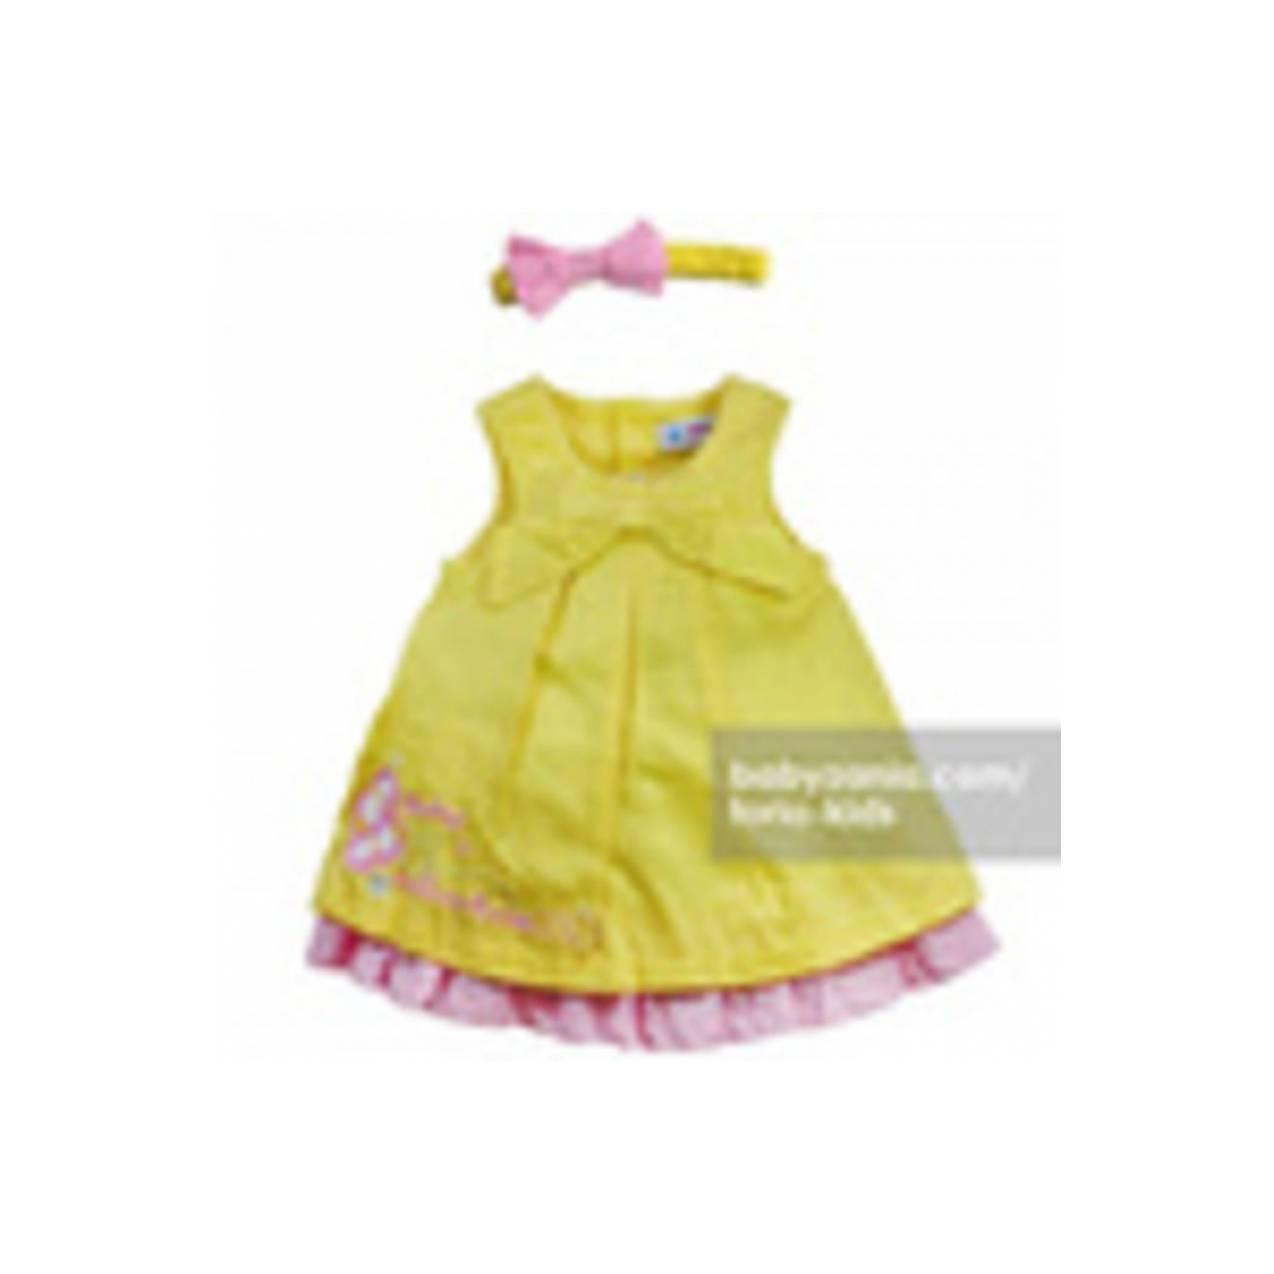 Torio Little Shoes Mini Dress Headband Accessories T2909